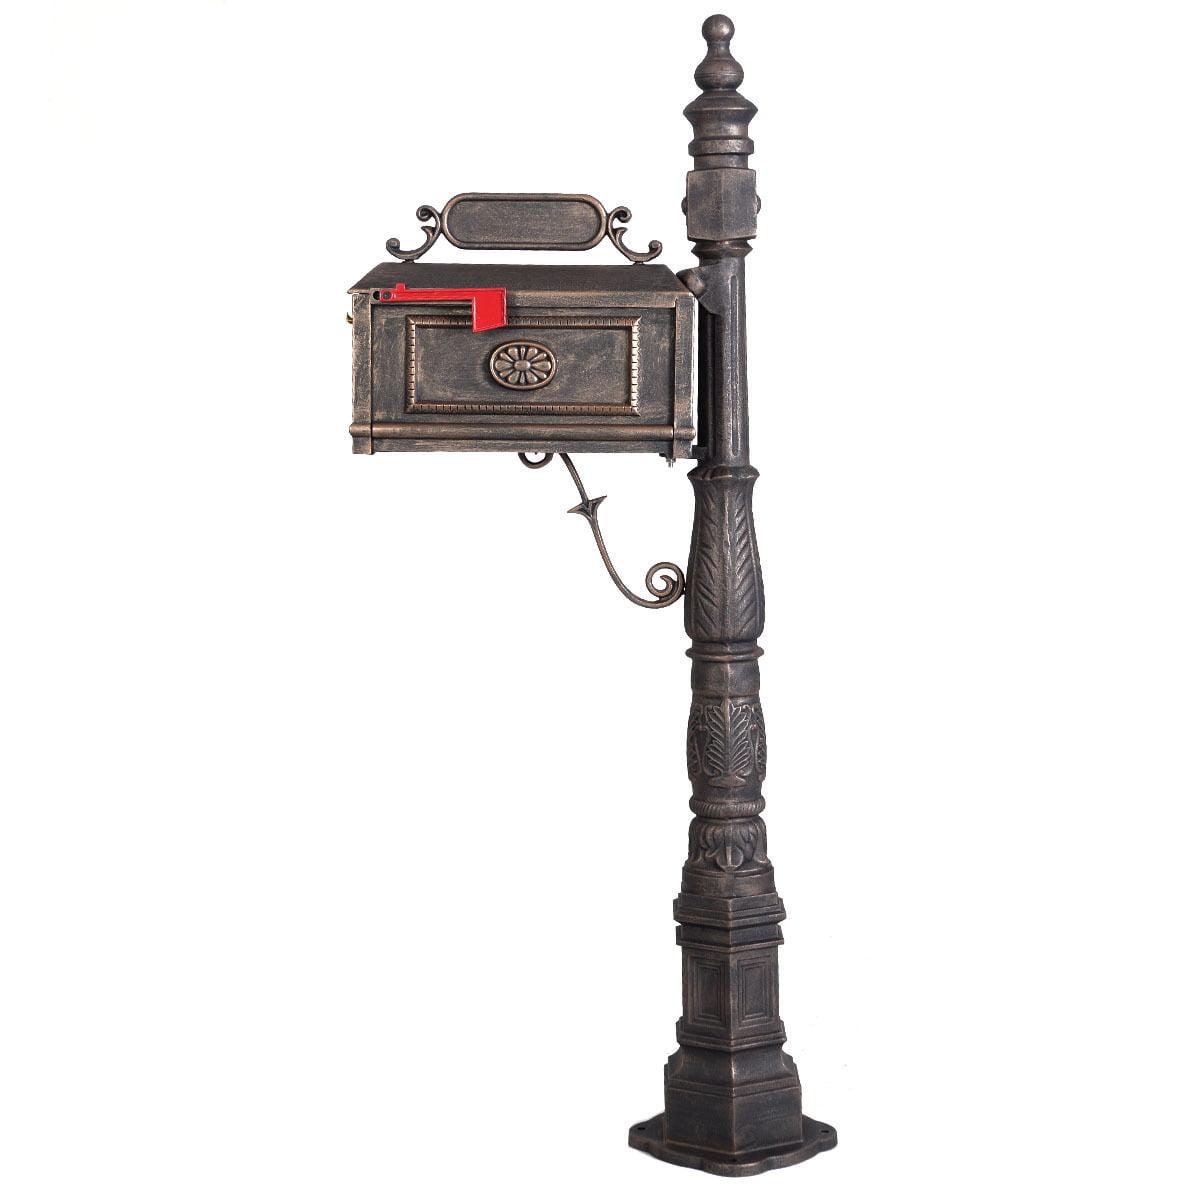 Costway Classic Decorative Cast Aluminum Mail Box Mailboxs Postal Box Vertical Pedestal... by Costway